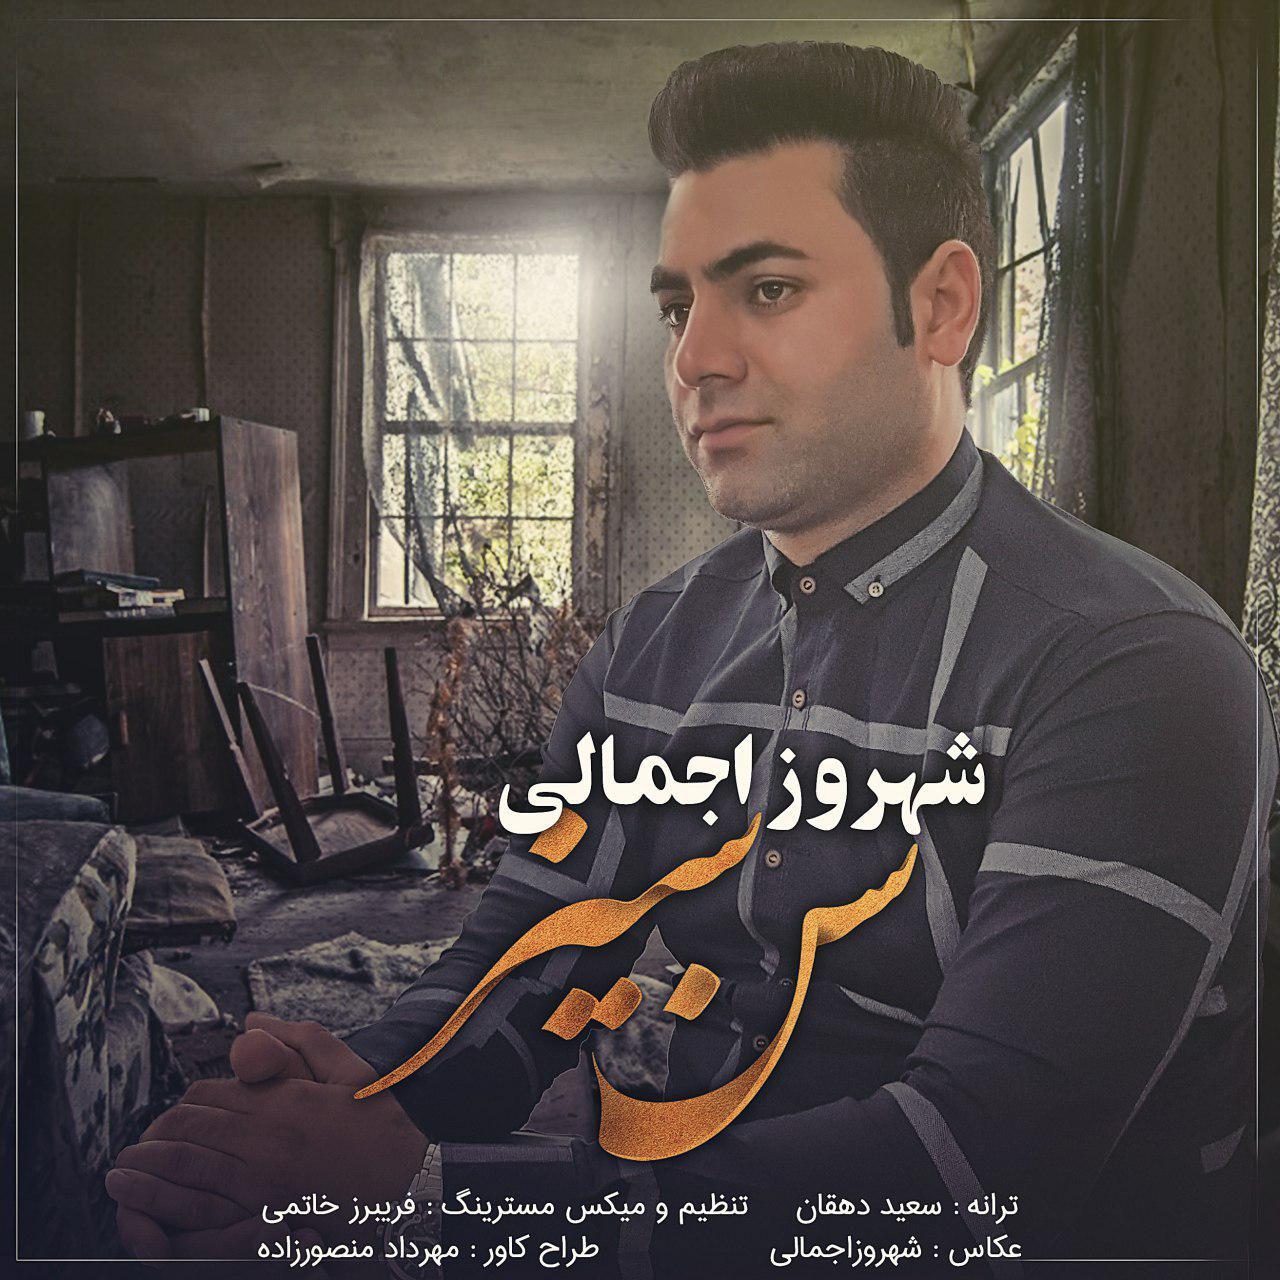 http://s9.picofile.com/file/8305981818/24Shahrooz_Ejmali_San_Siz.jpg